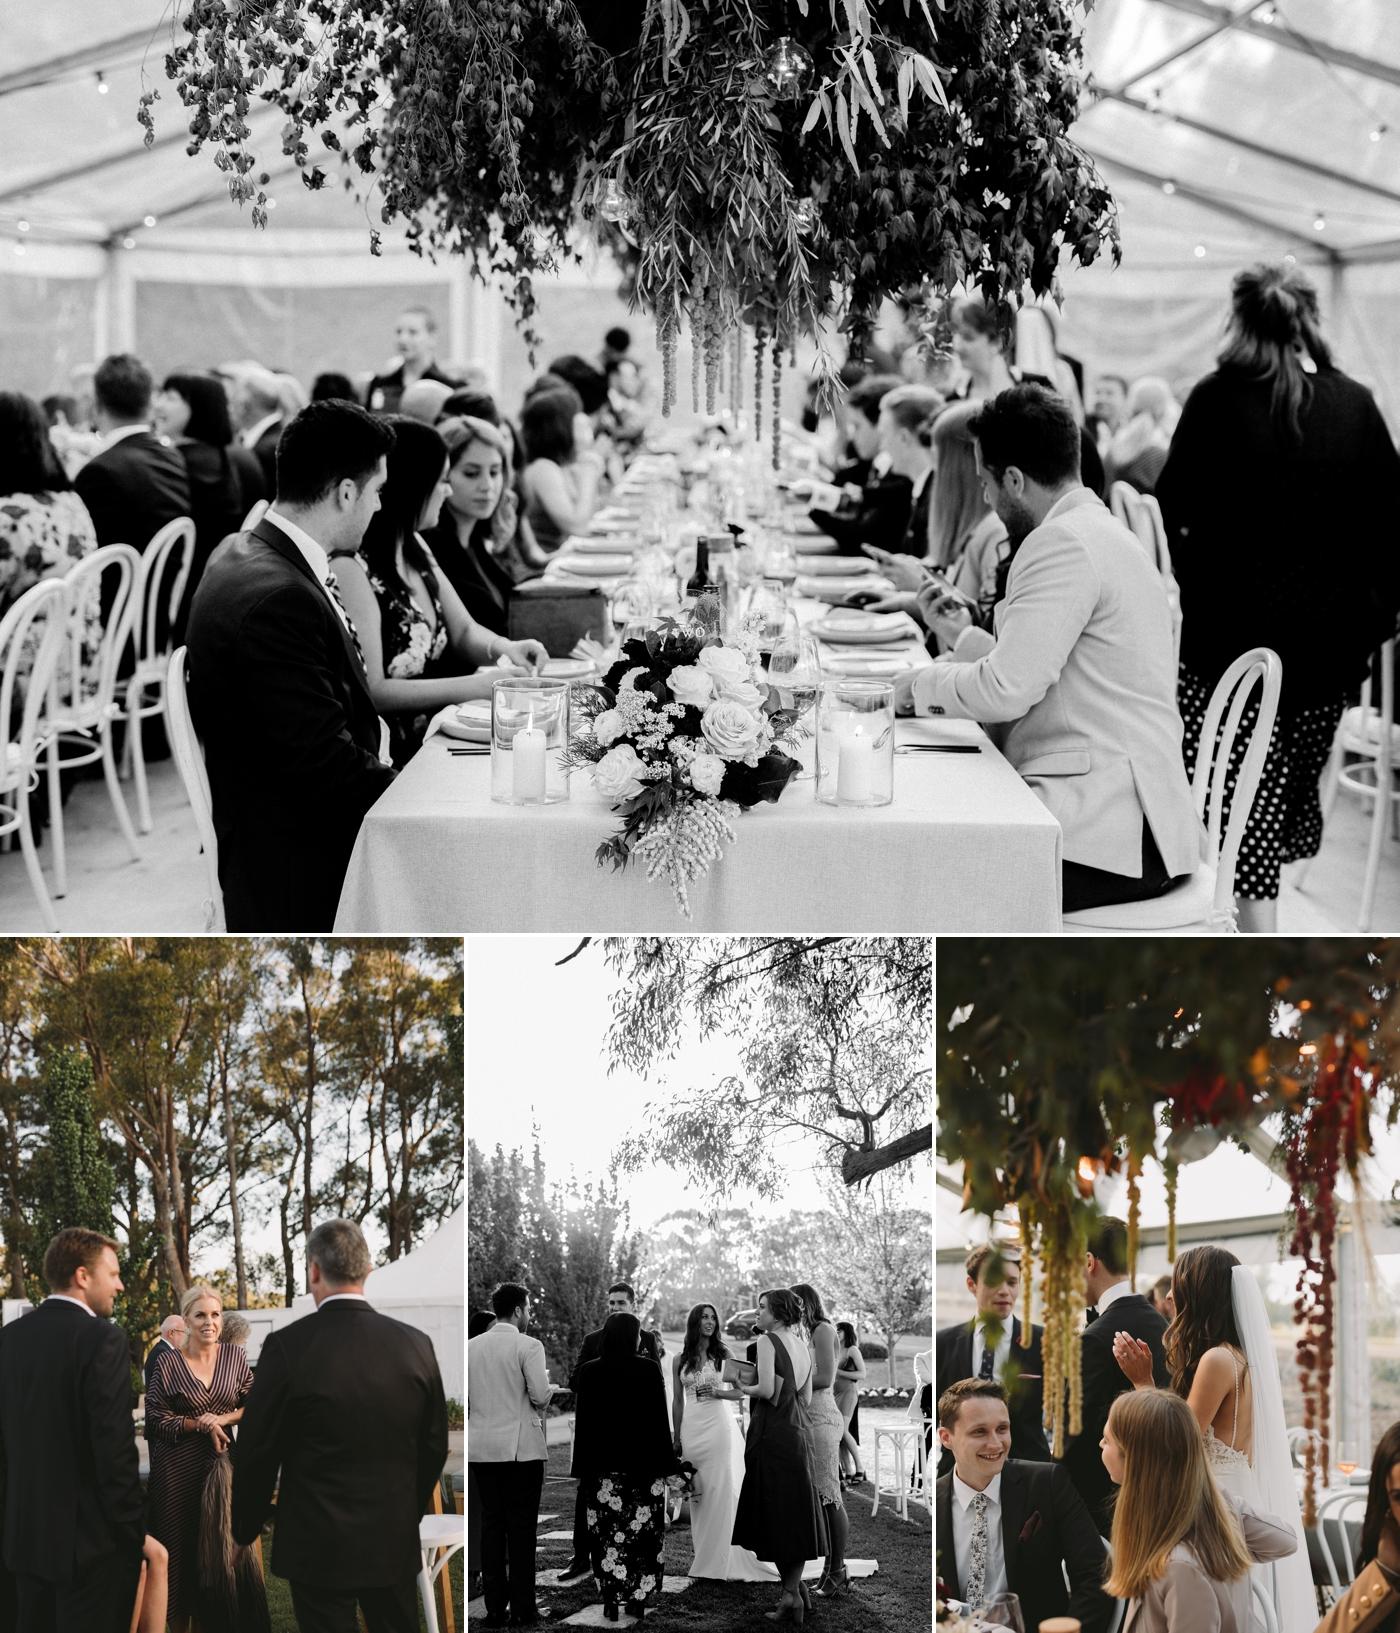 Katie and Ben - Natural Wedding Photography in Adelaide - Beautiful, Candid Wedding Photographer - Adelaide Hills Wedding - Katherine Schultz - www.katherineschultzphotography.com_0057.jpg